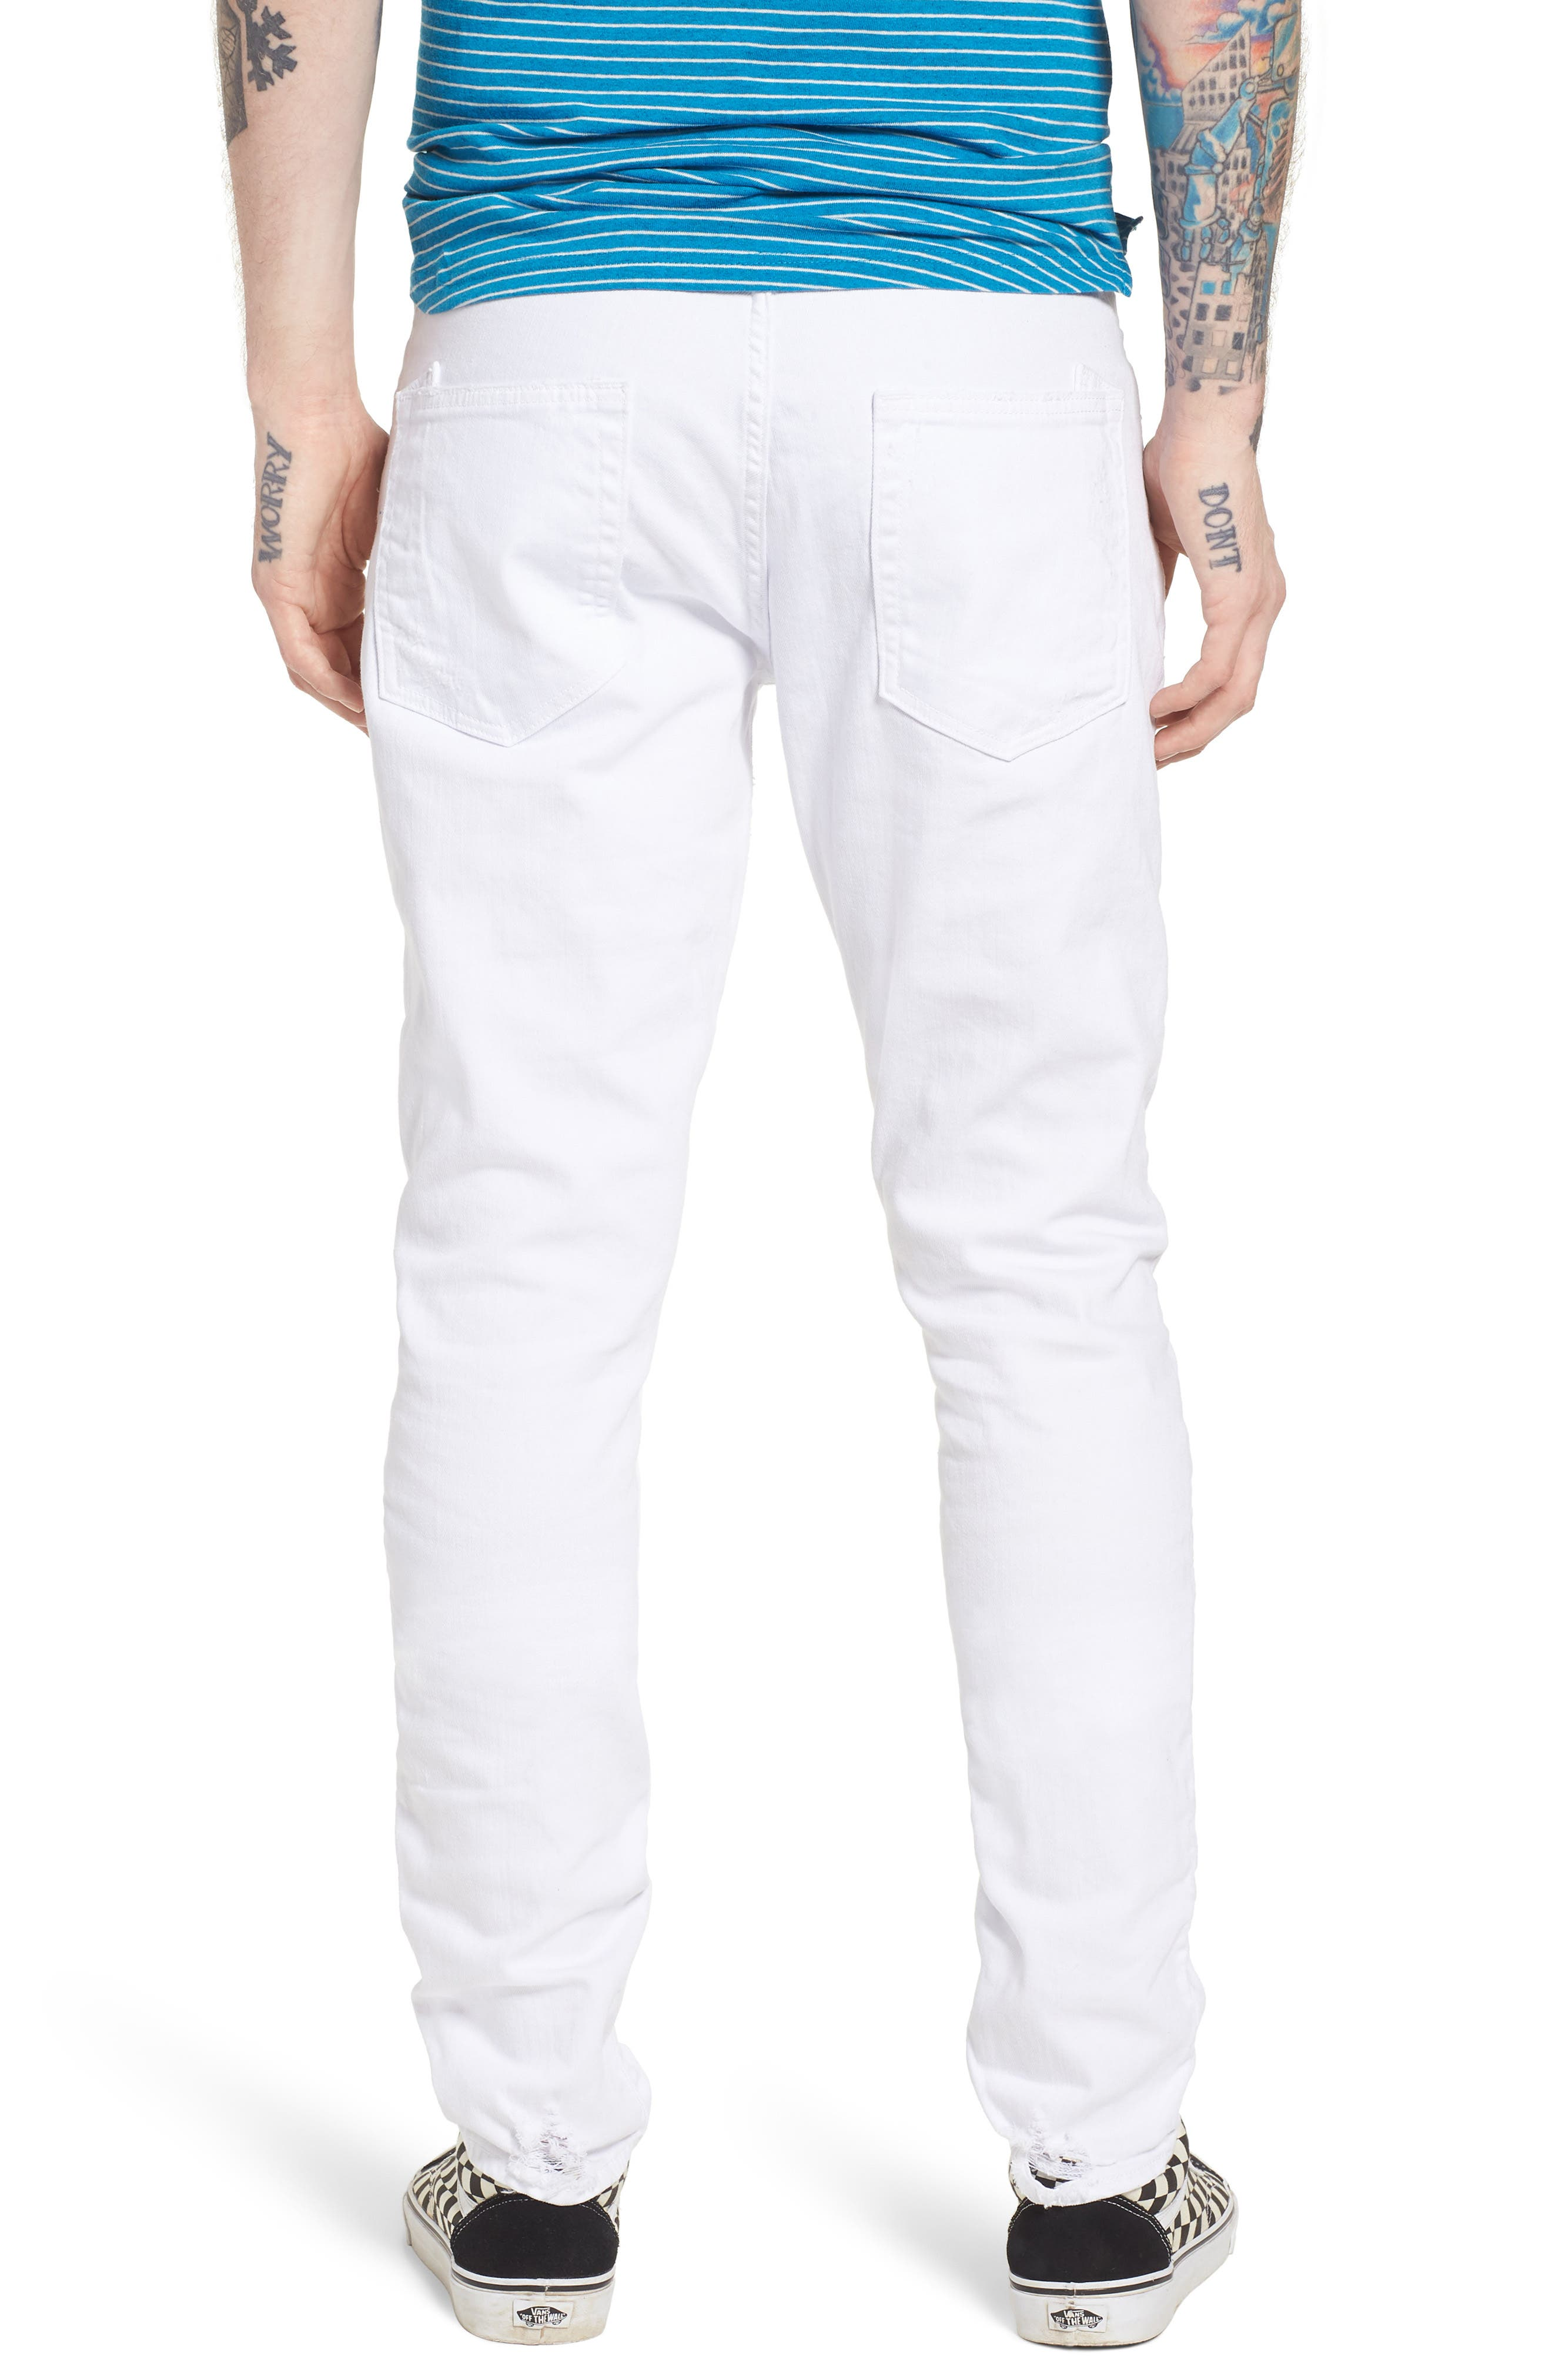 Windsor Slim Fit Jeans,                             Alternate thumbnail 2, color,                             Living White